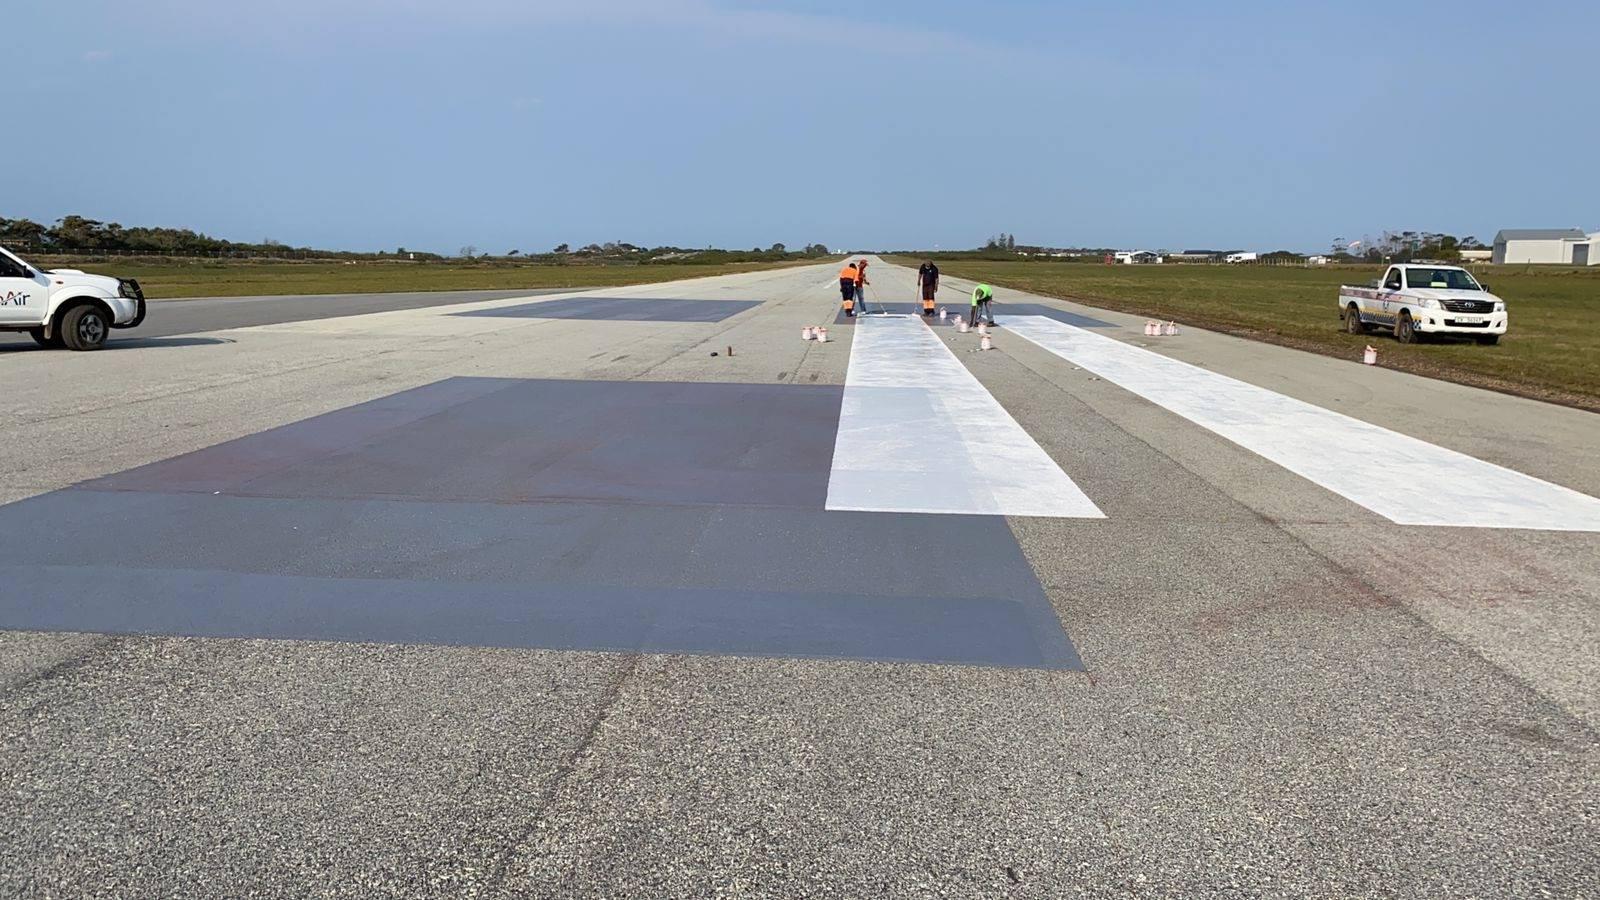 plett airport repairing painting runway